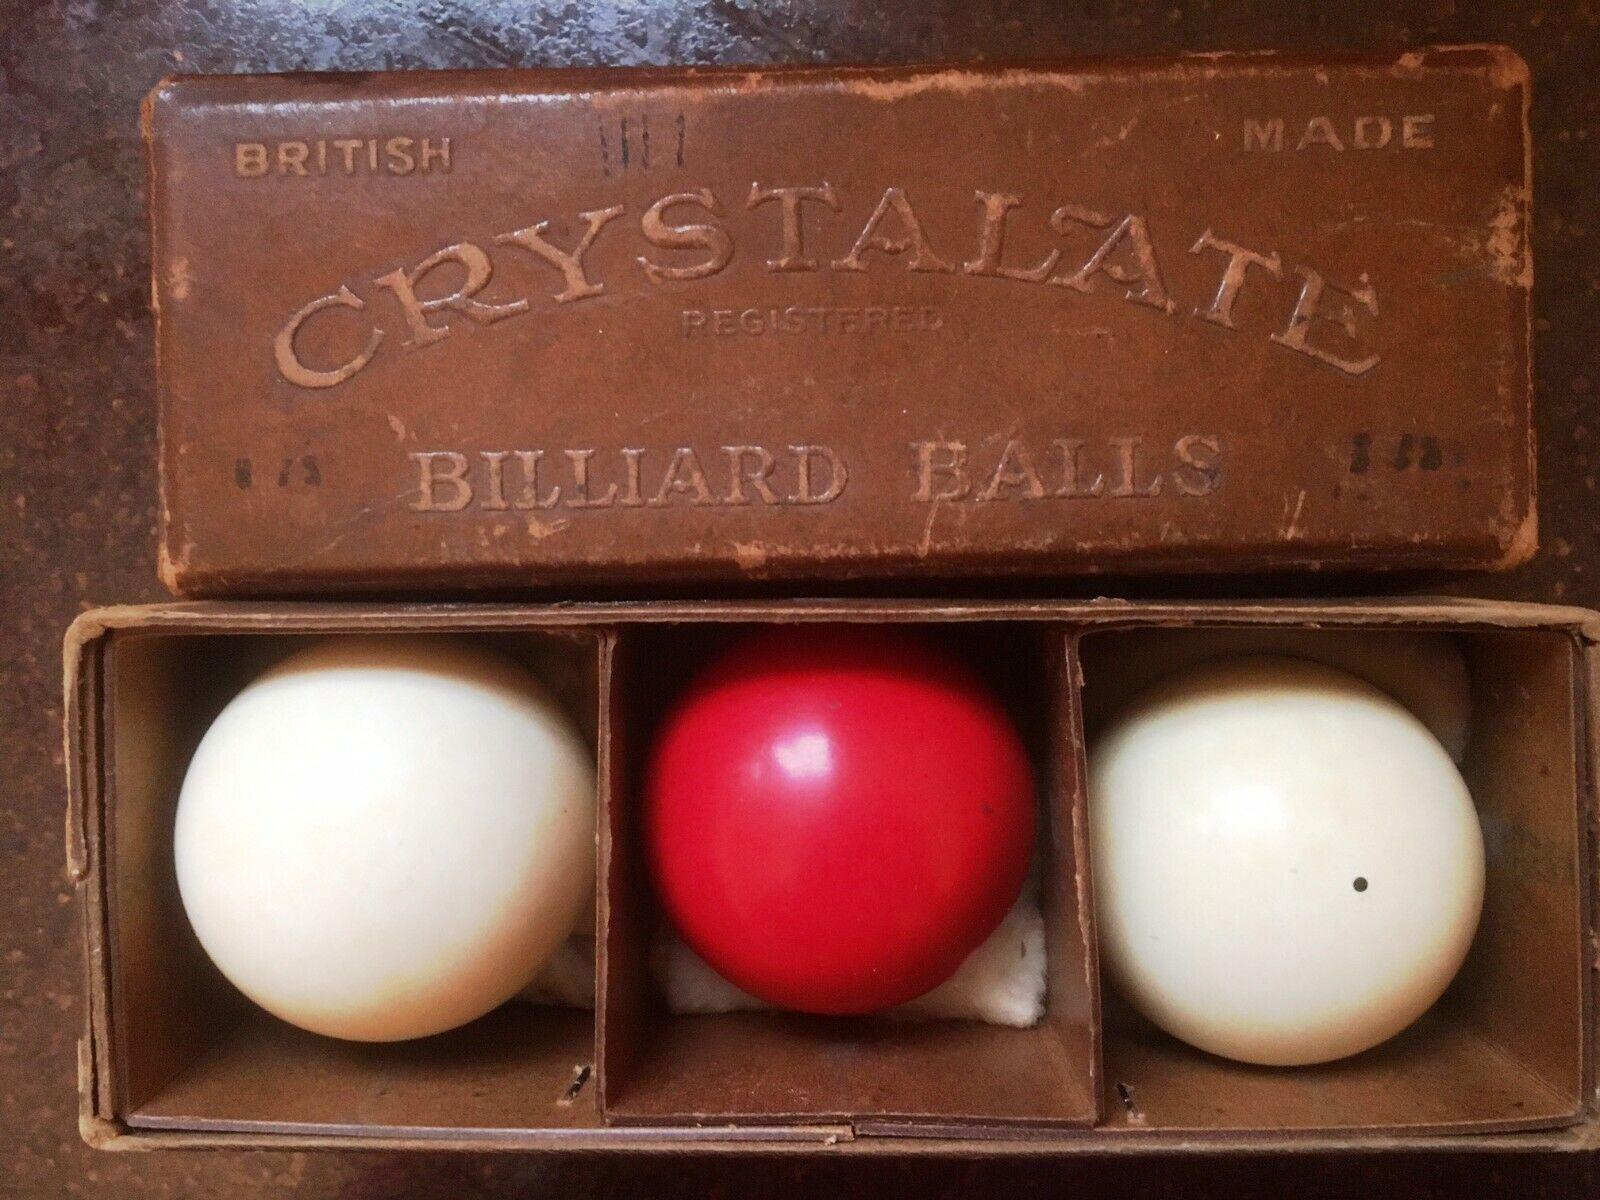 Vintage Crystalate Billiard Balls Burroughes and Watts Ltd  Original Box  CLEAN